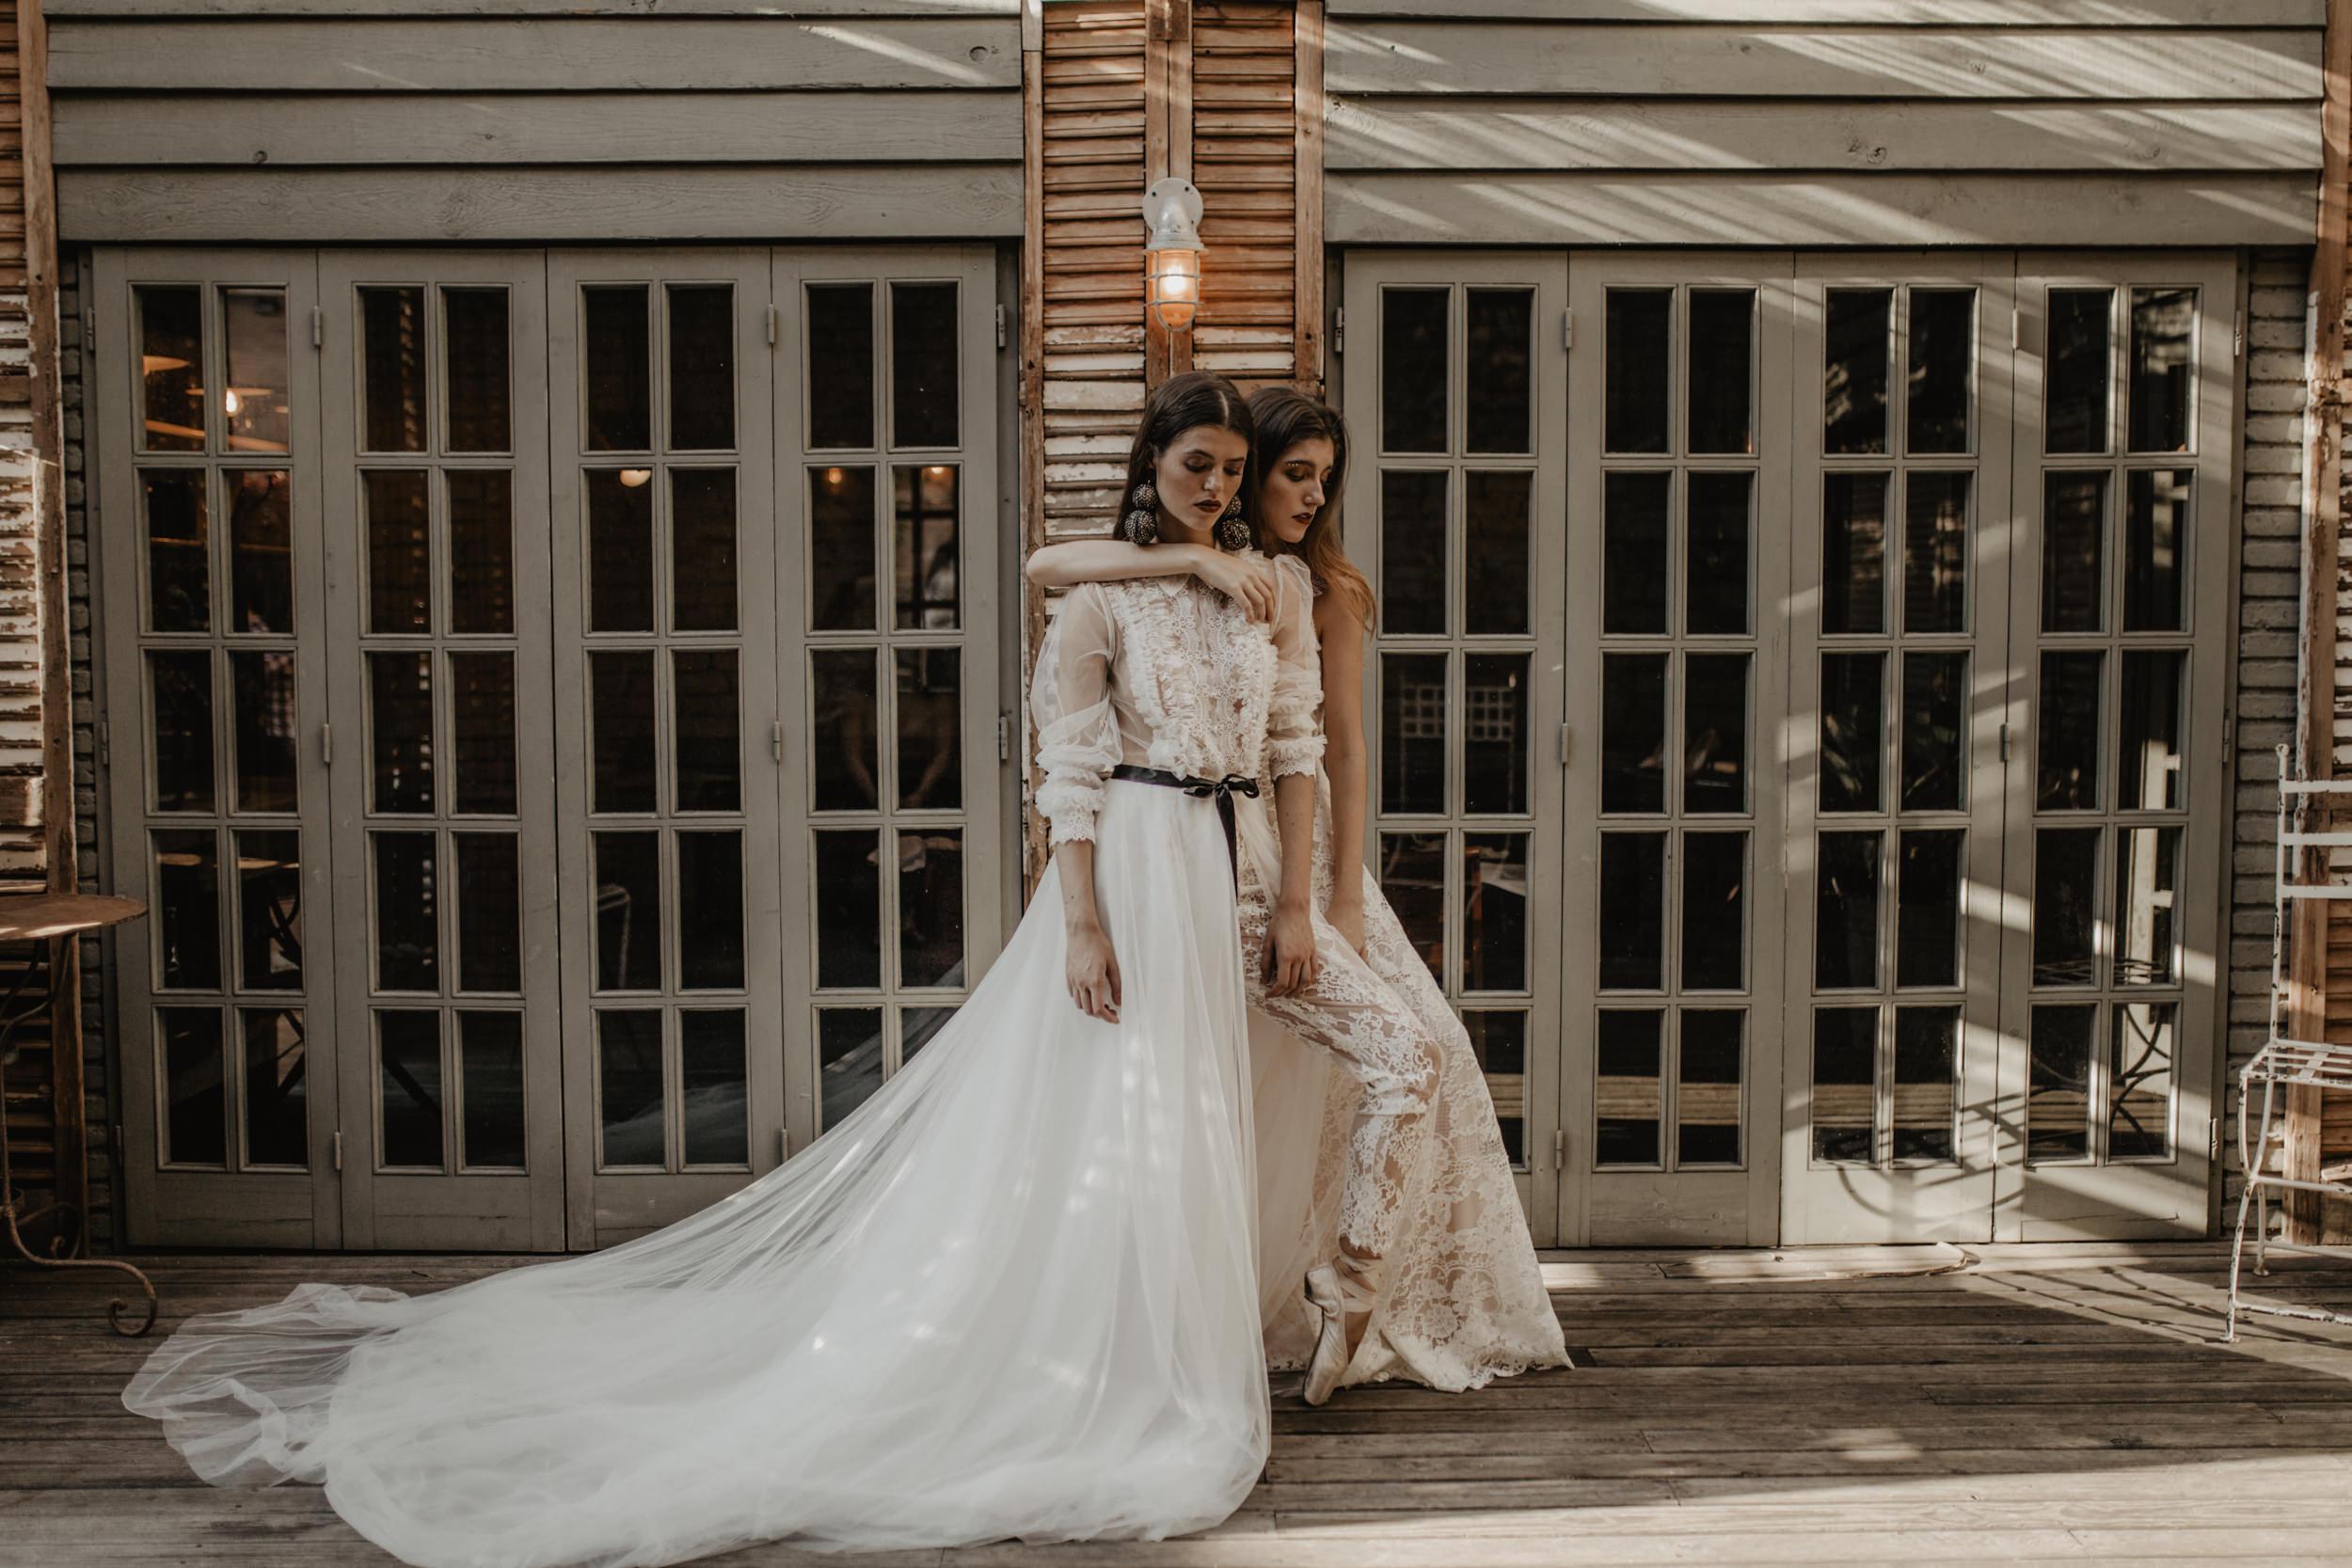 thenortherngirlphotography_photography_thenortherngirl_rebeccascabros_wedding_weddingphotography_weddingphotographer_barcelona_fashionbarcelona_unconventionalwedding_lacasademuñecas-168.jpg